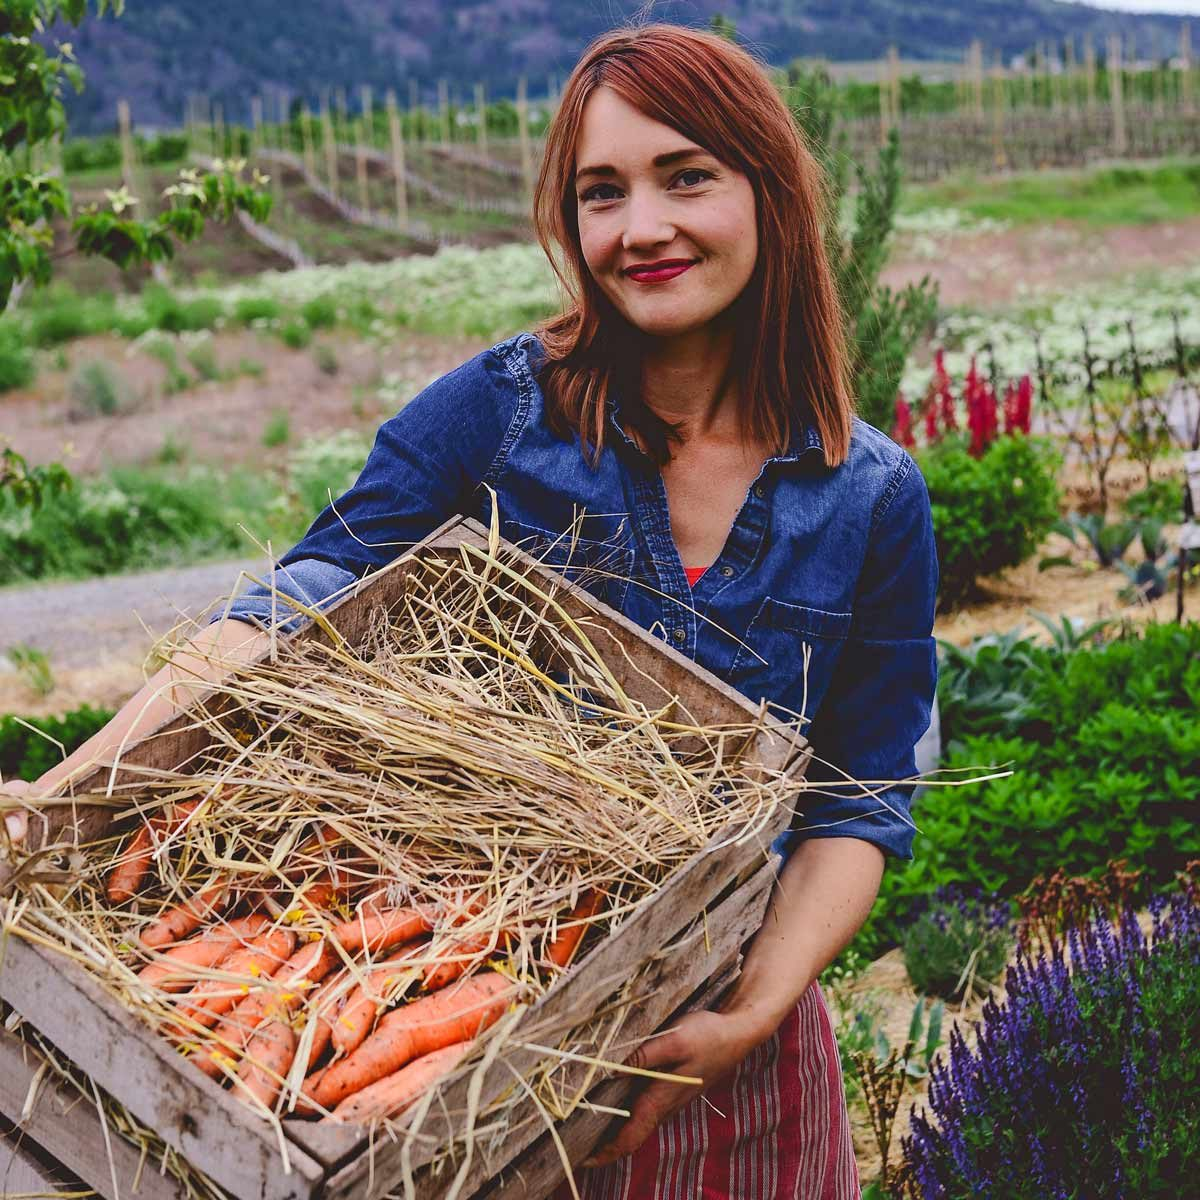 rootcellar_10 farming fresh carrots woman farmer